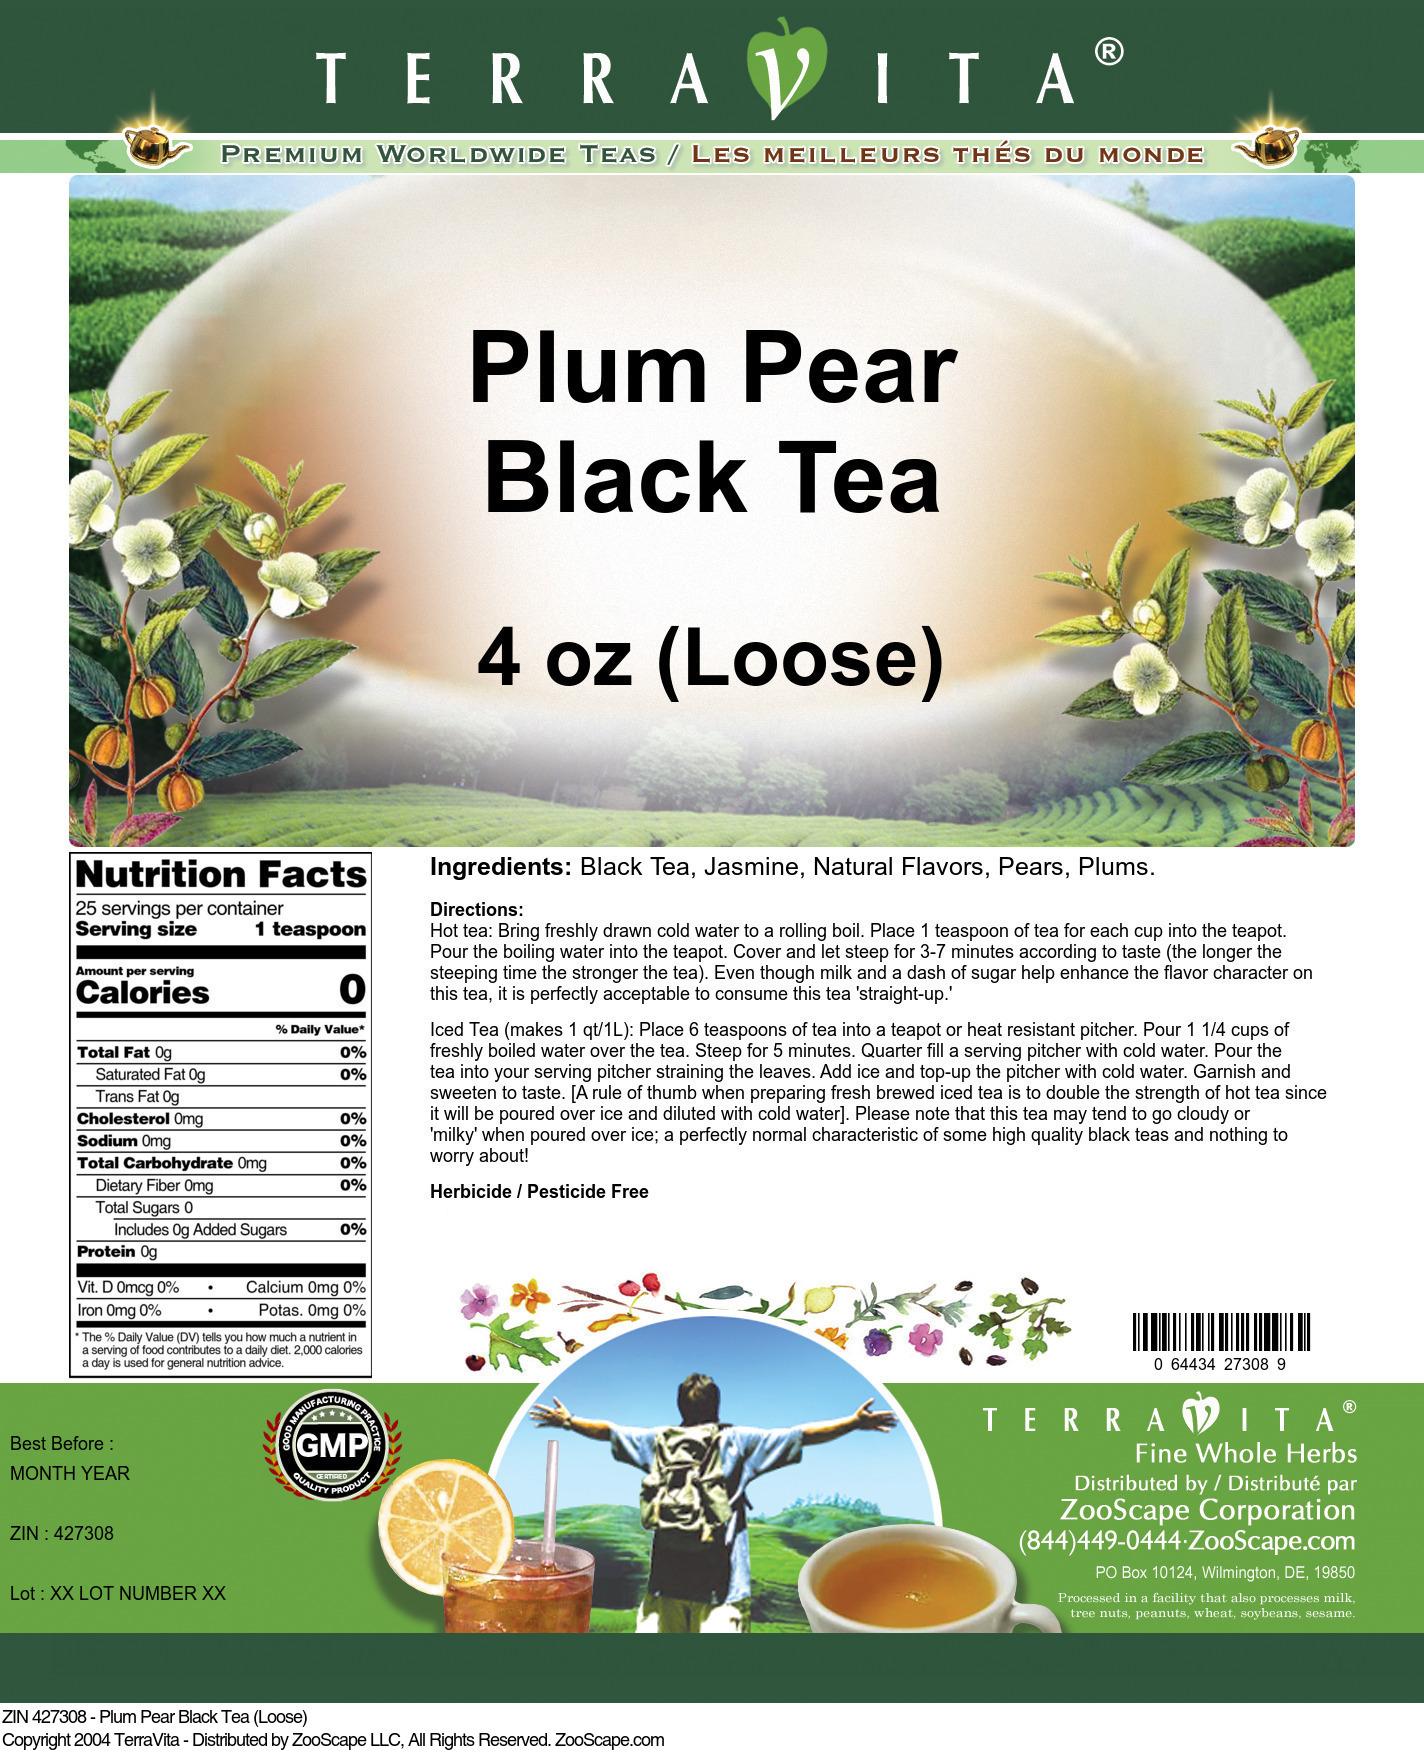 Plum Pear Black